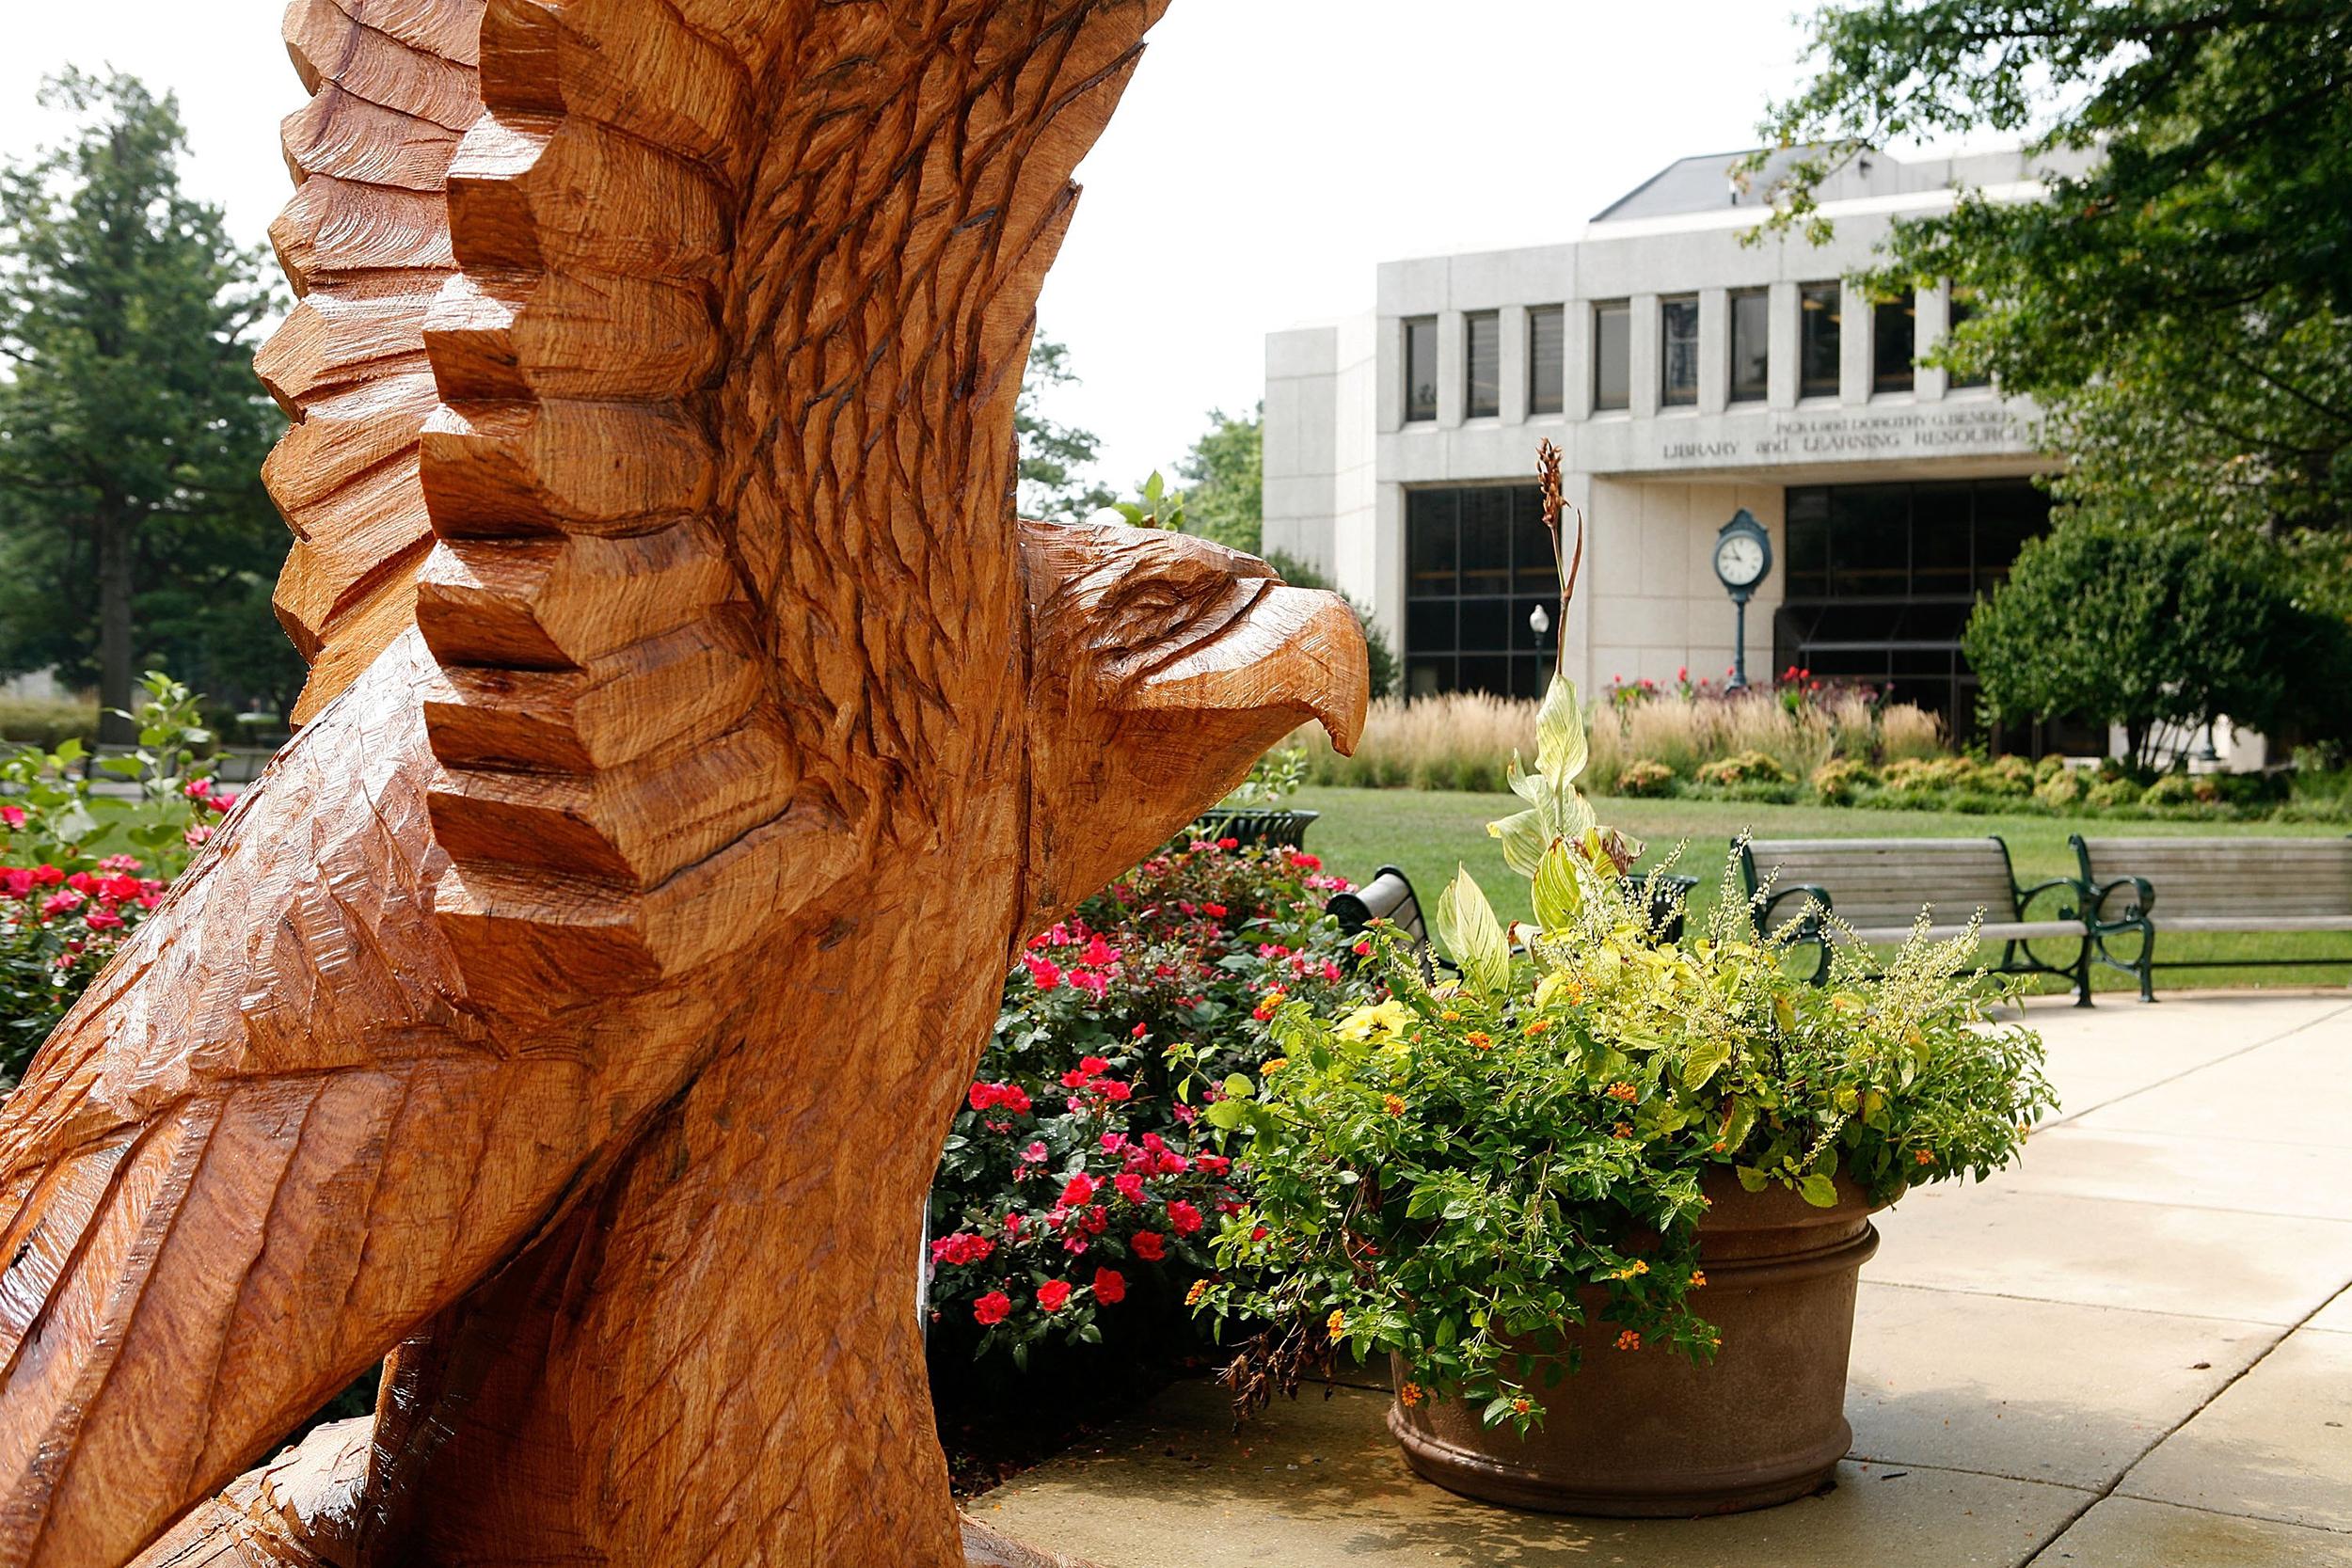 Image: American University in Washington, D.C.